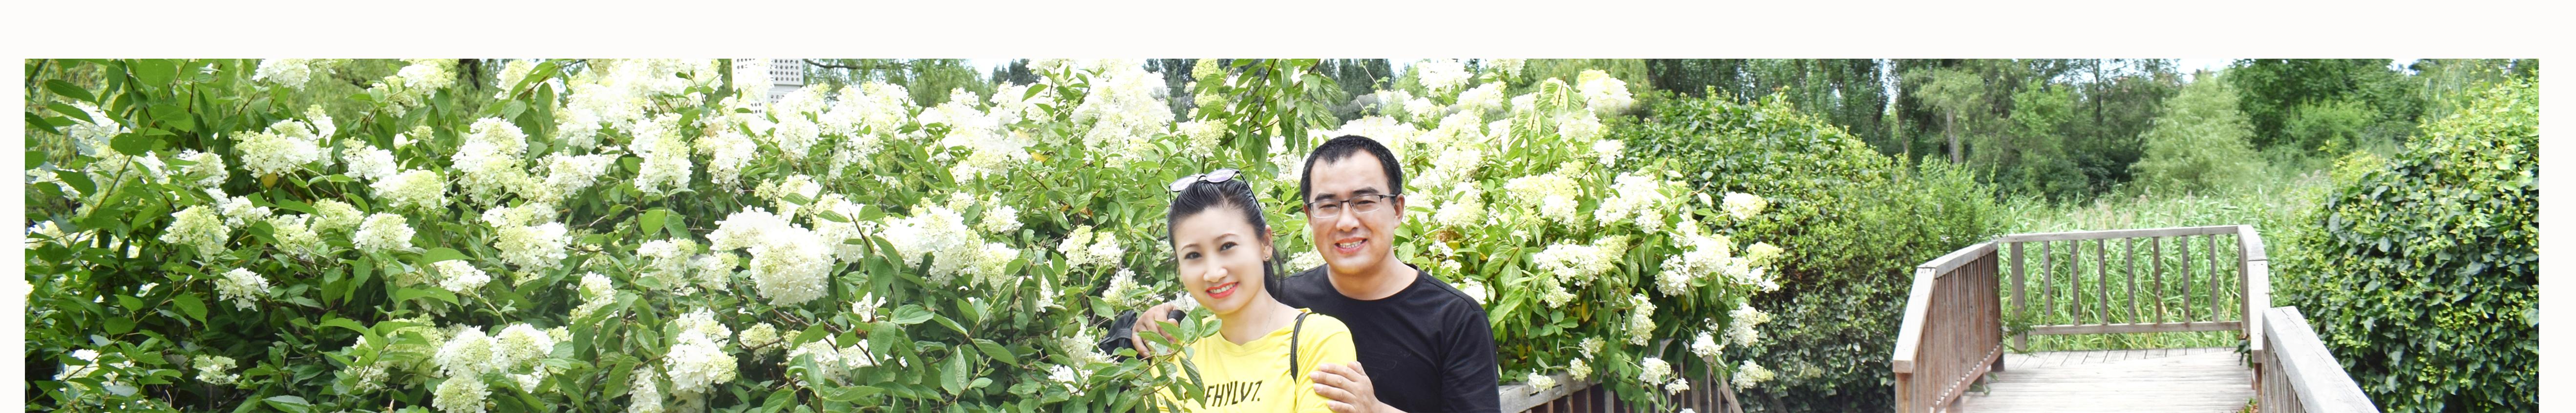 春暖花开工作室 banner